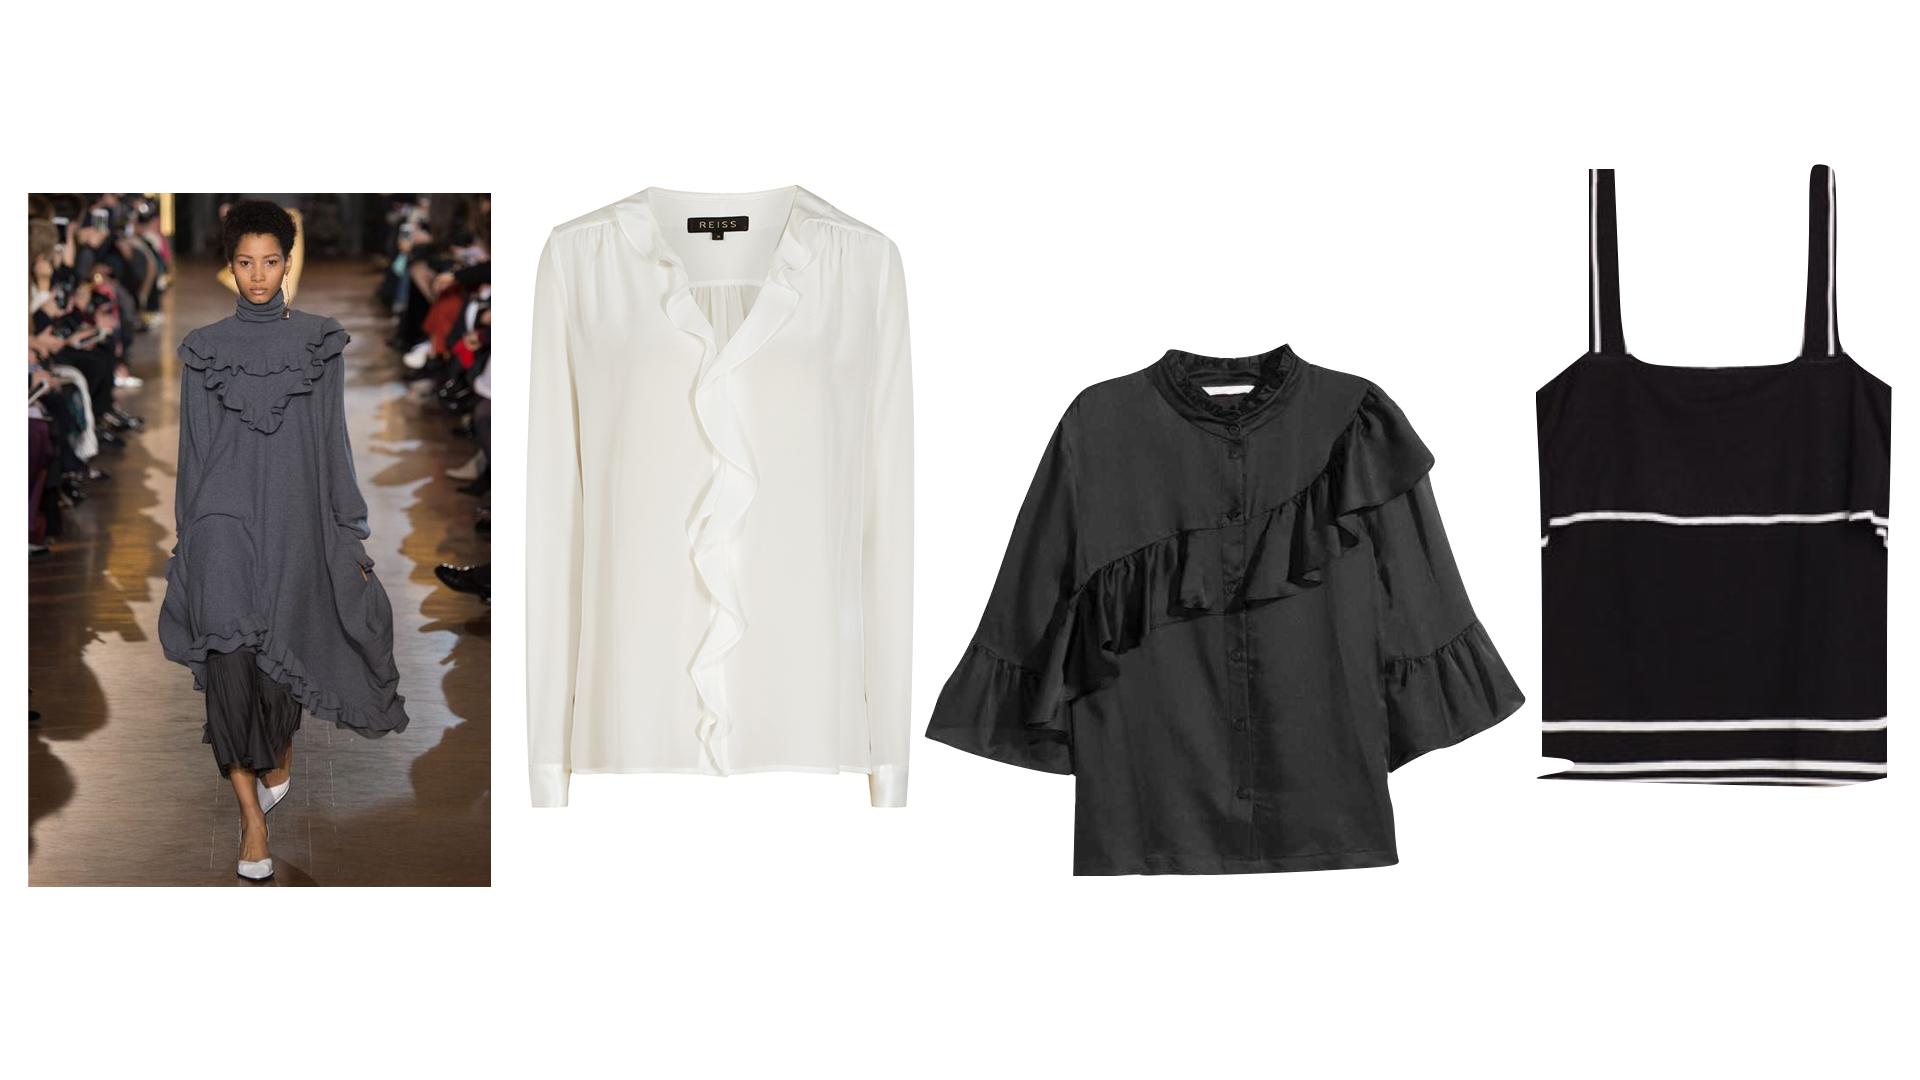 REISS WHITE BLOUSE  |  H&M BLACK BLOUSE   | ZARA KNITTED TOP